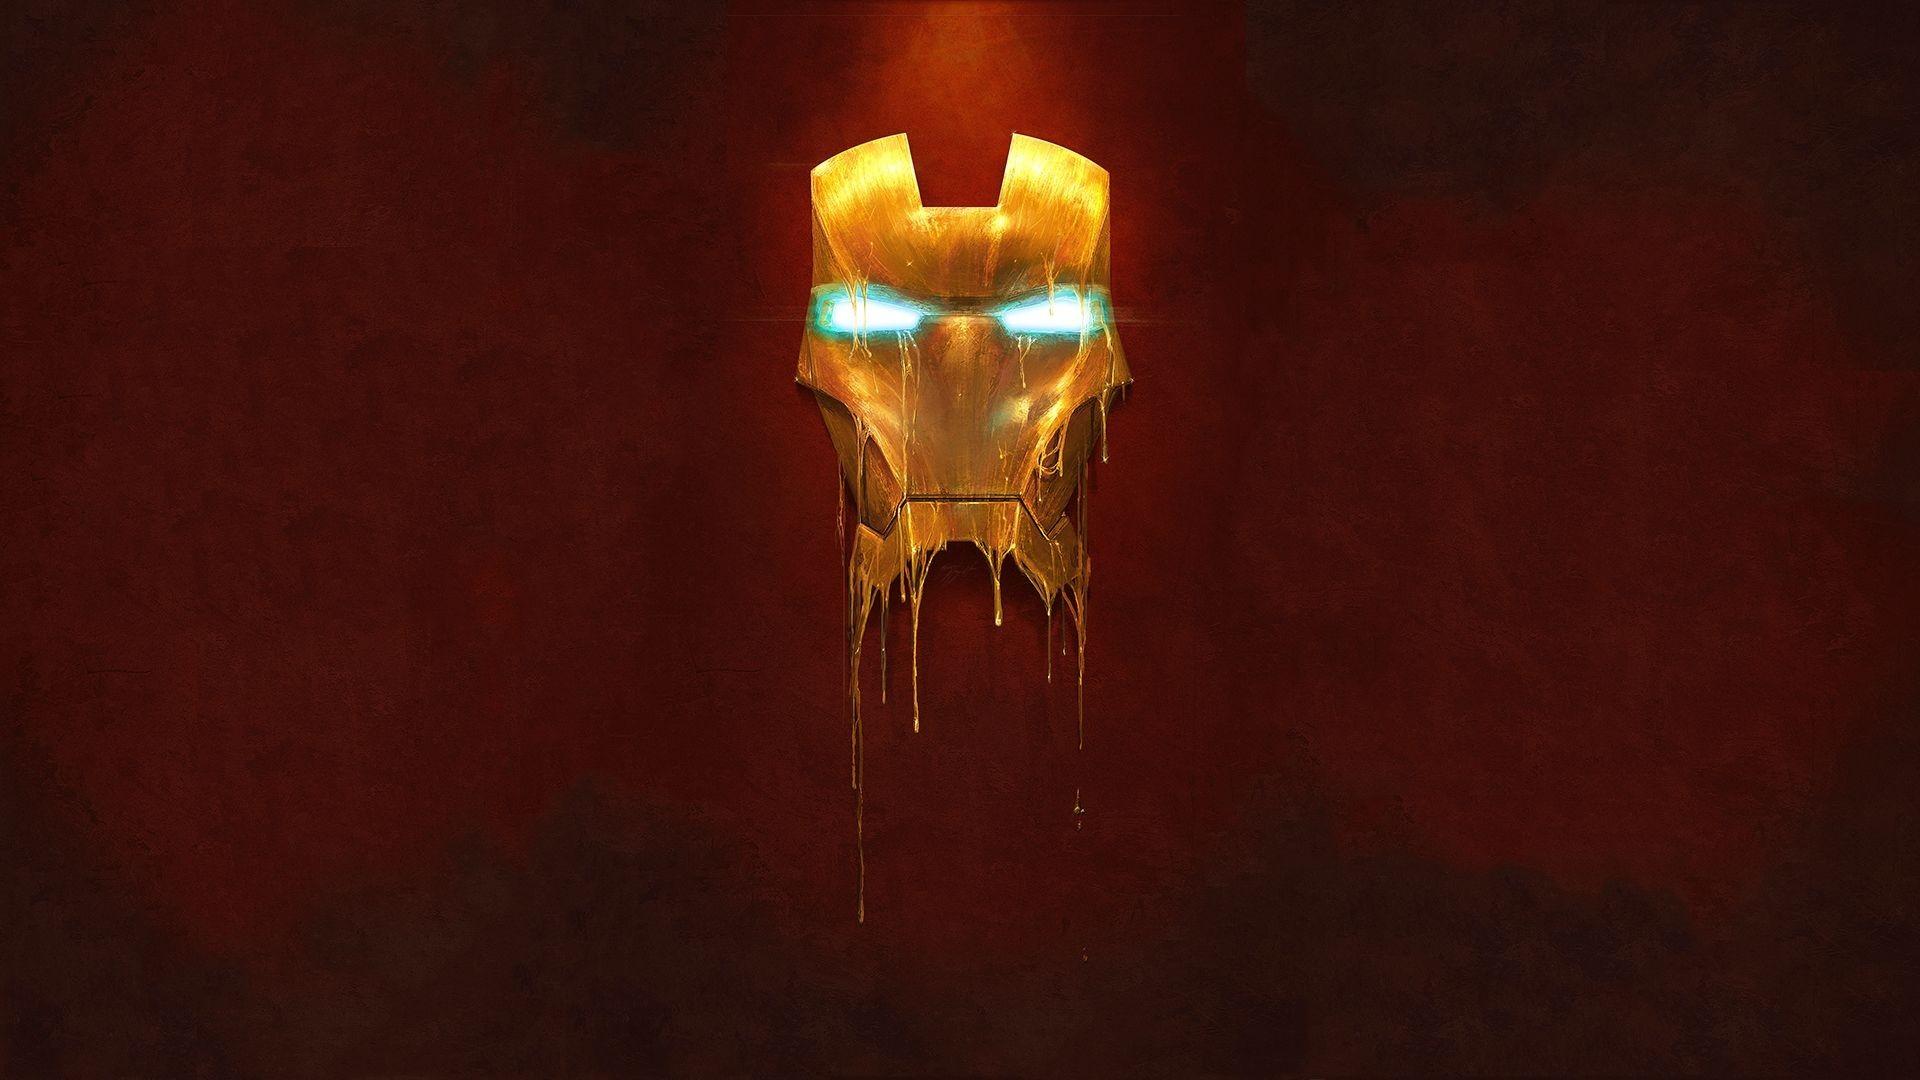 Wallpaper Iron Man